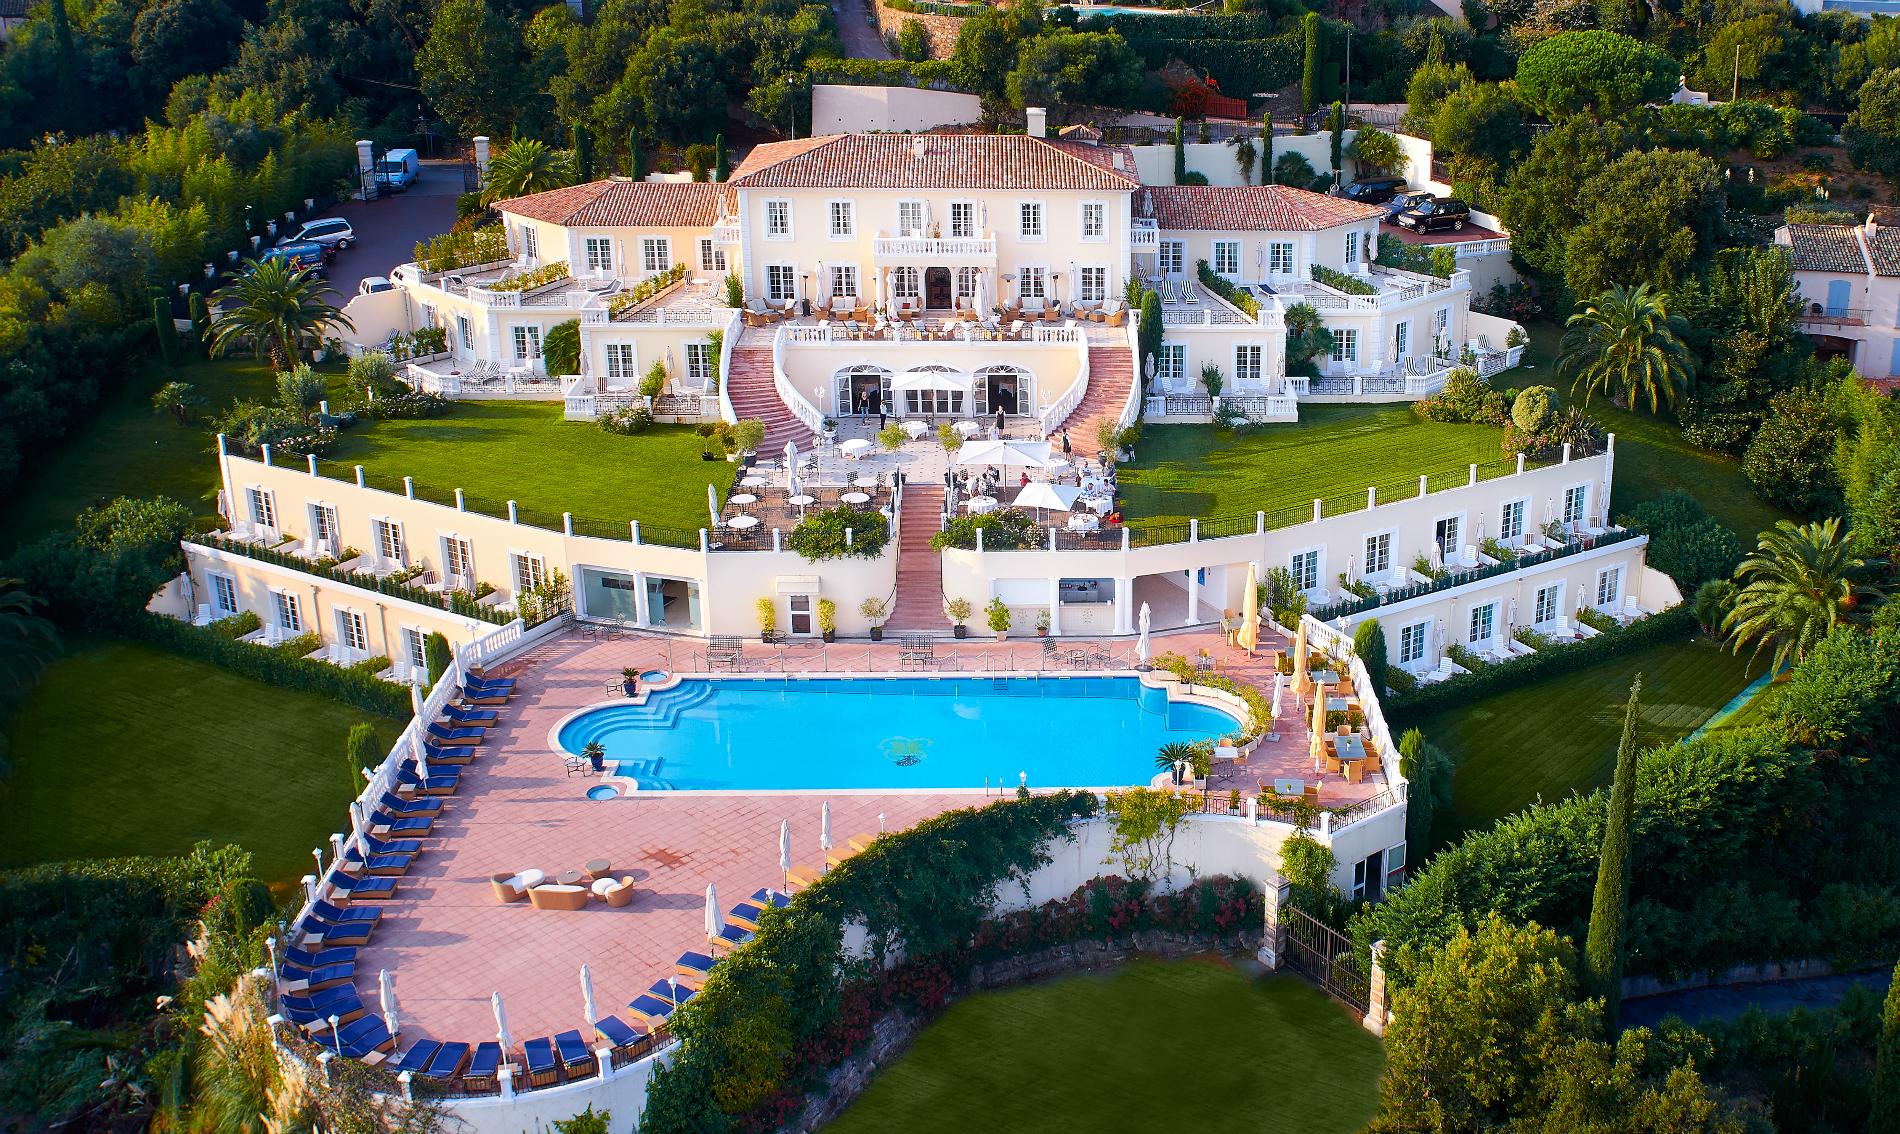 Althoff Hotel Villa Belrose Gassin St Tropez